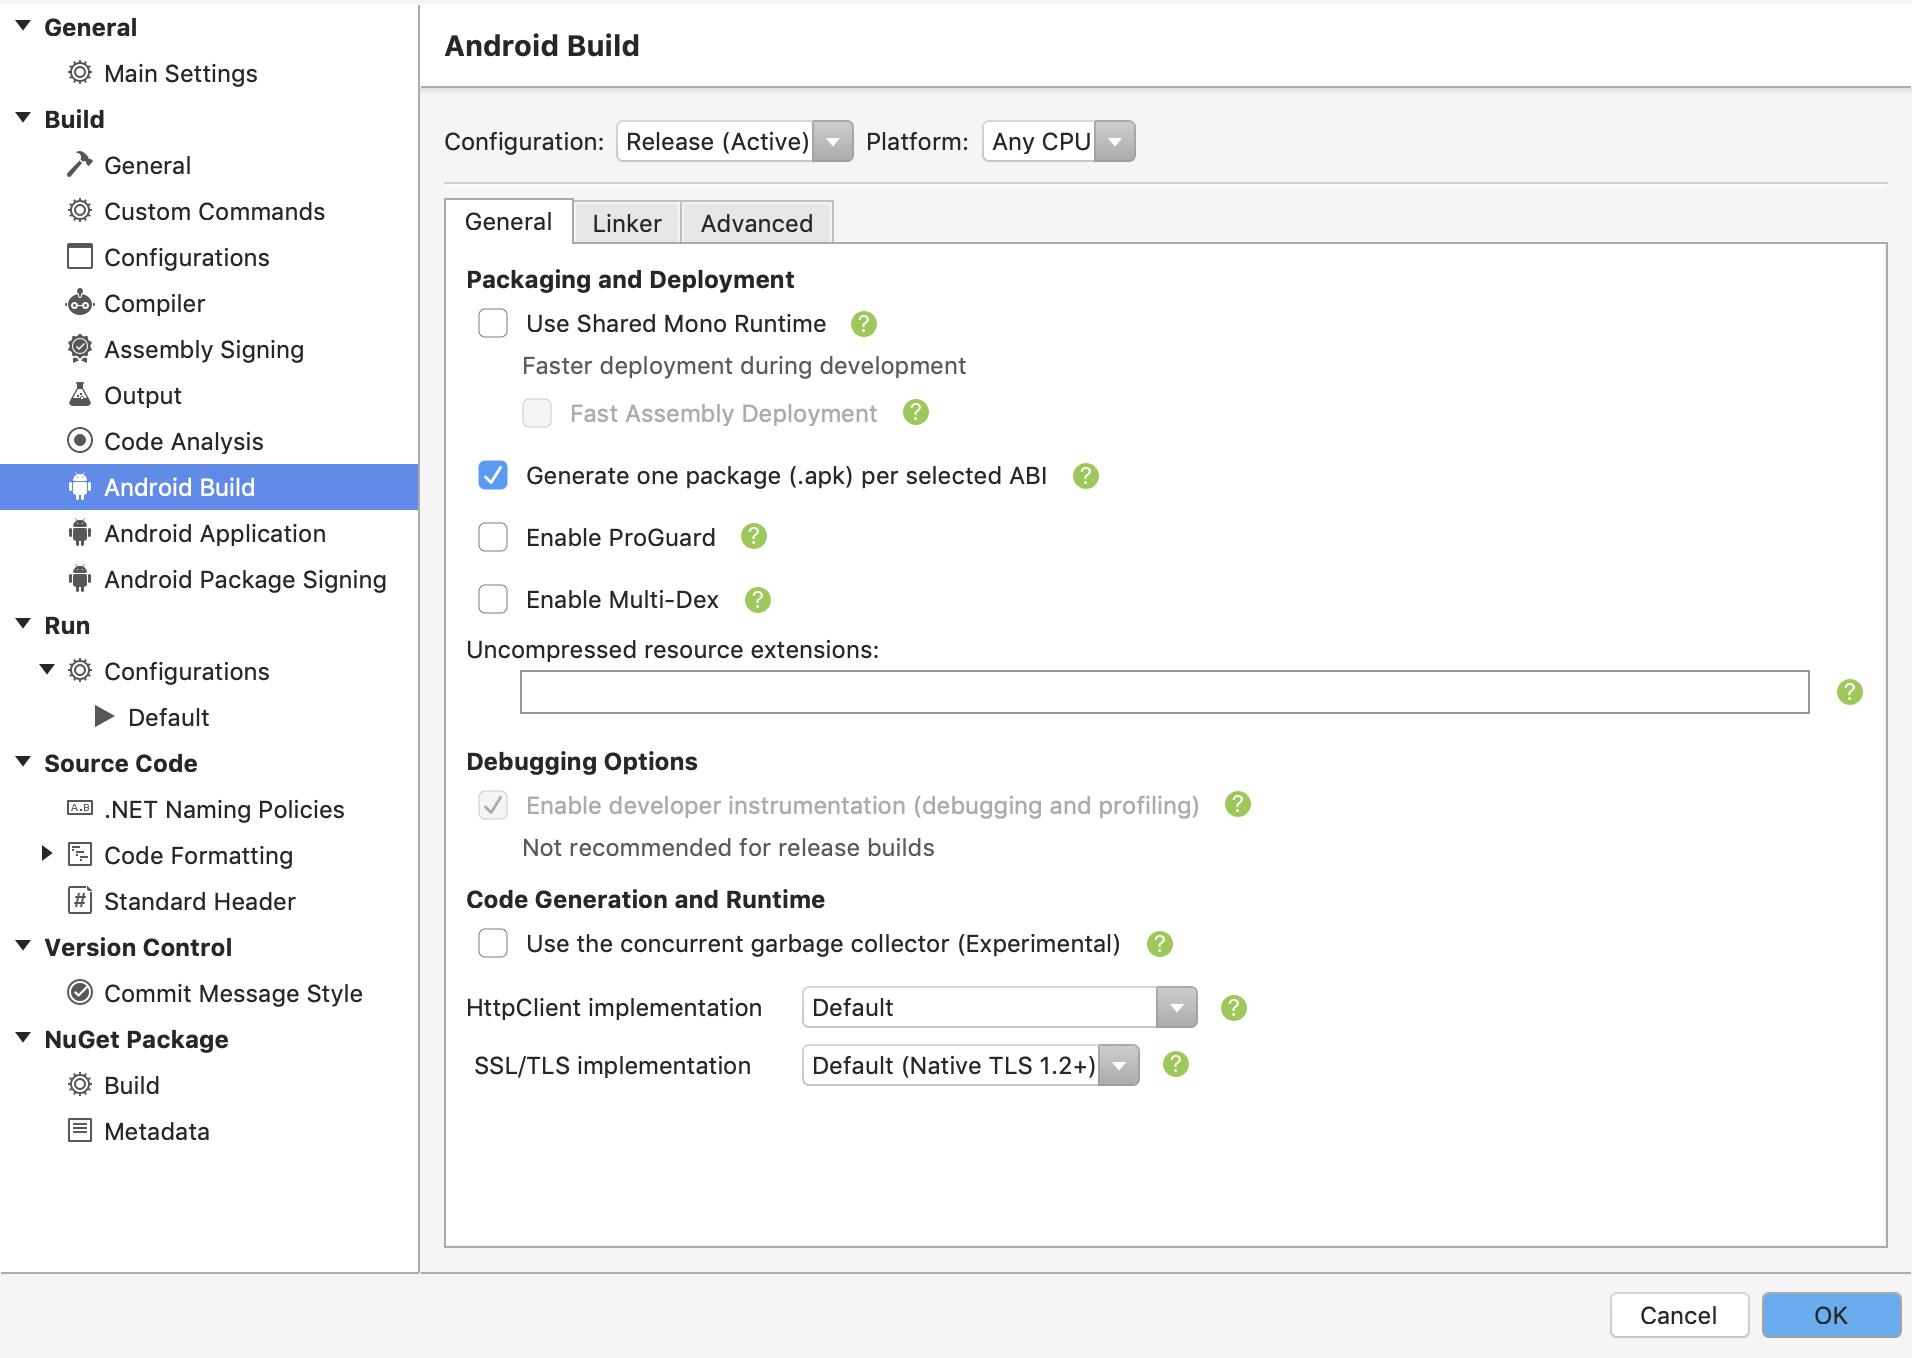 Build configurations fpr armeabi, armeabi-v7a and x86